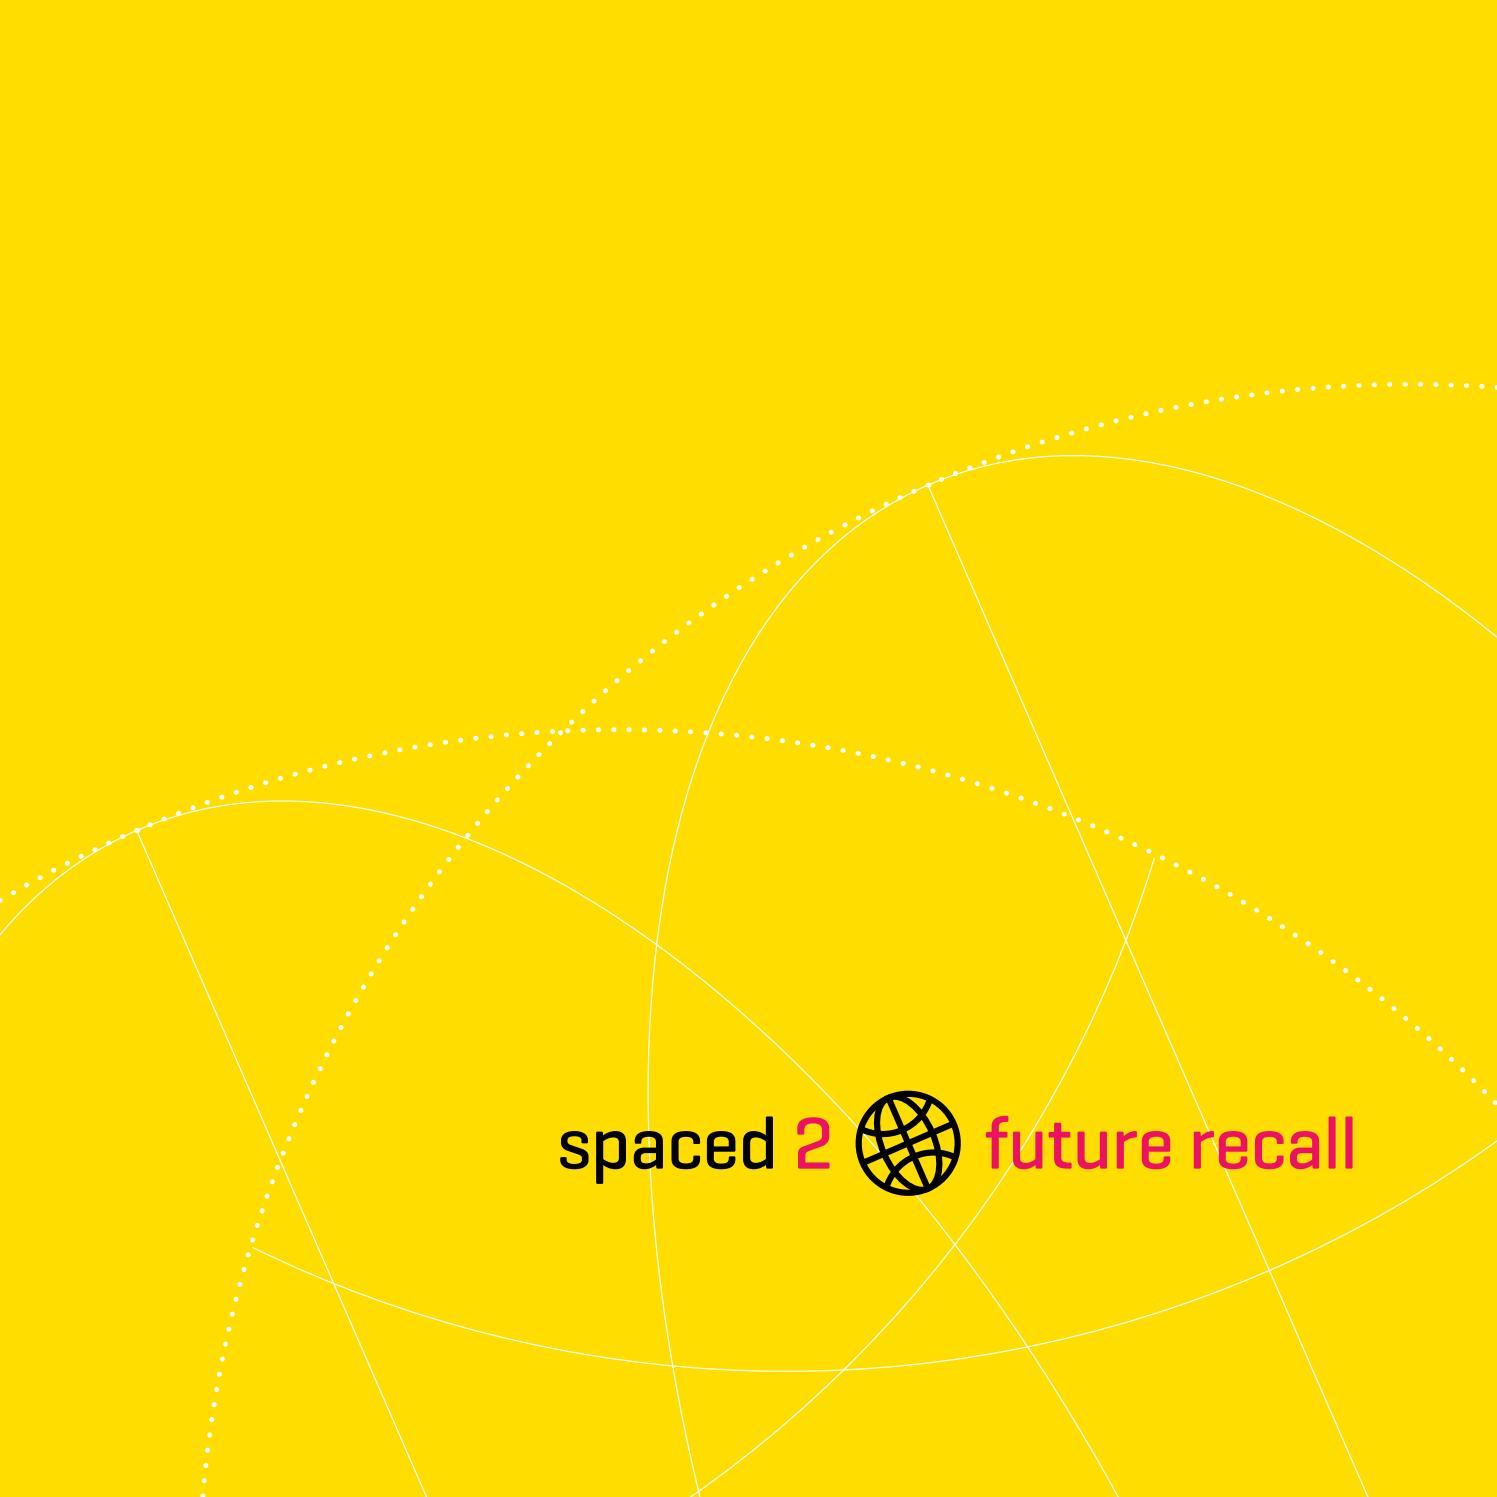 spaced 2: future recall